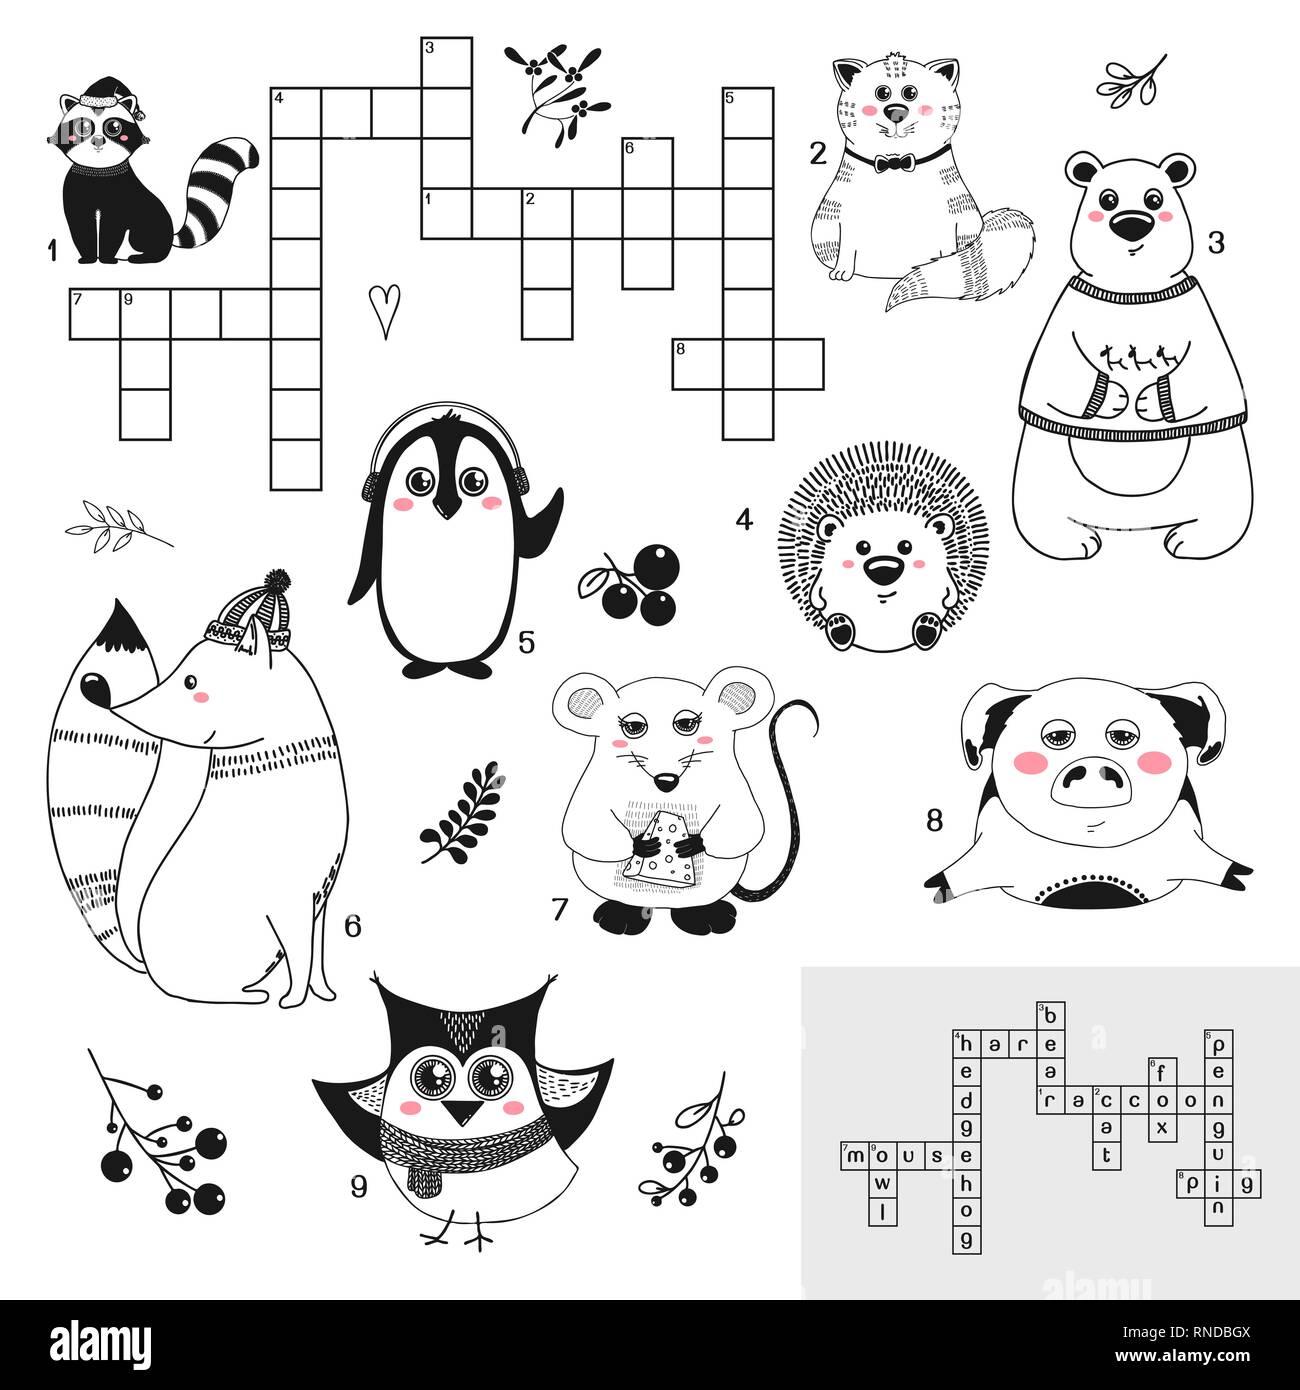 Illustration Game Children Crossword Immagini Illustration Game